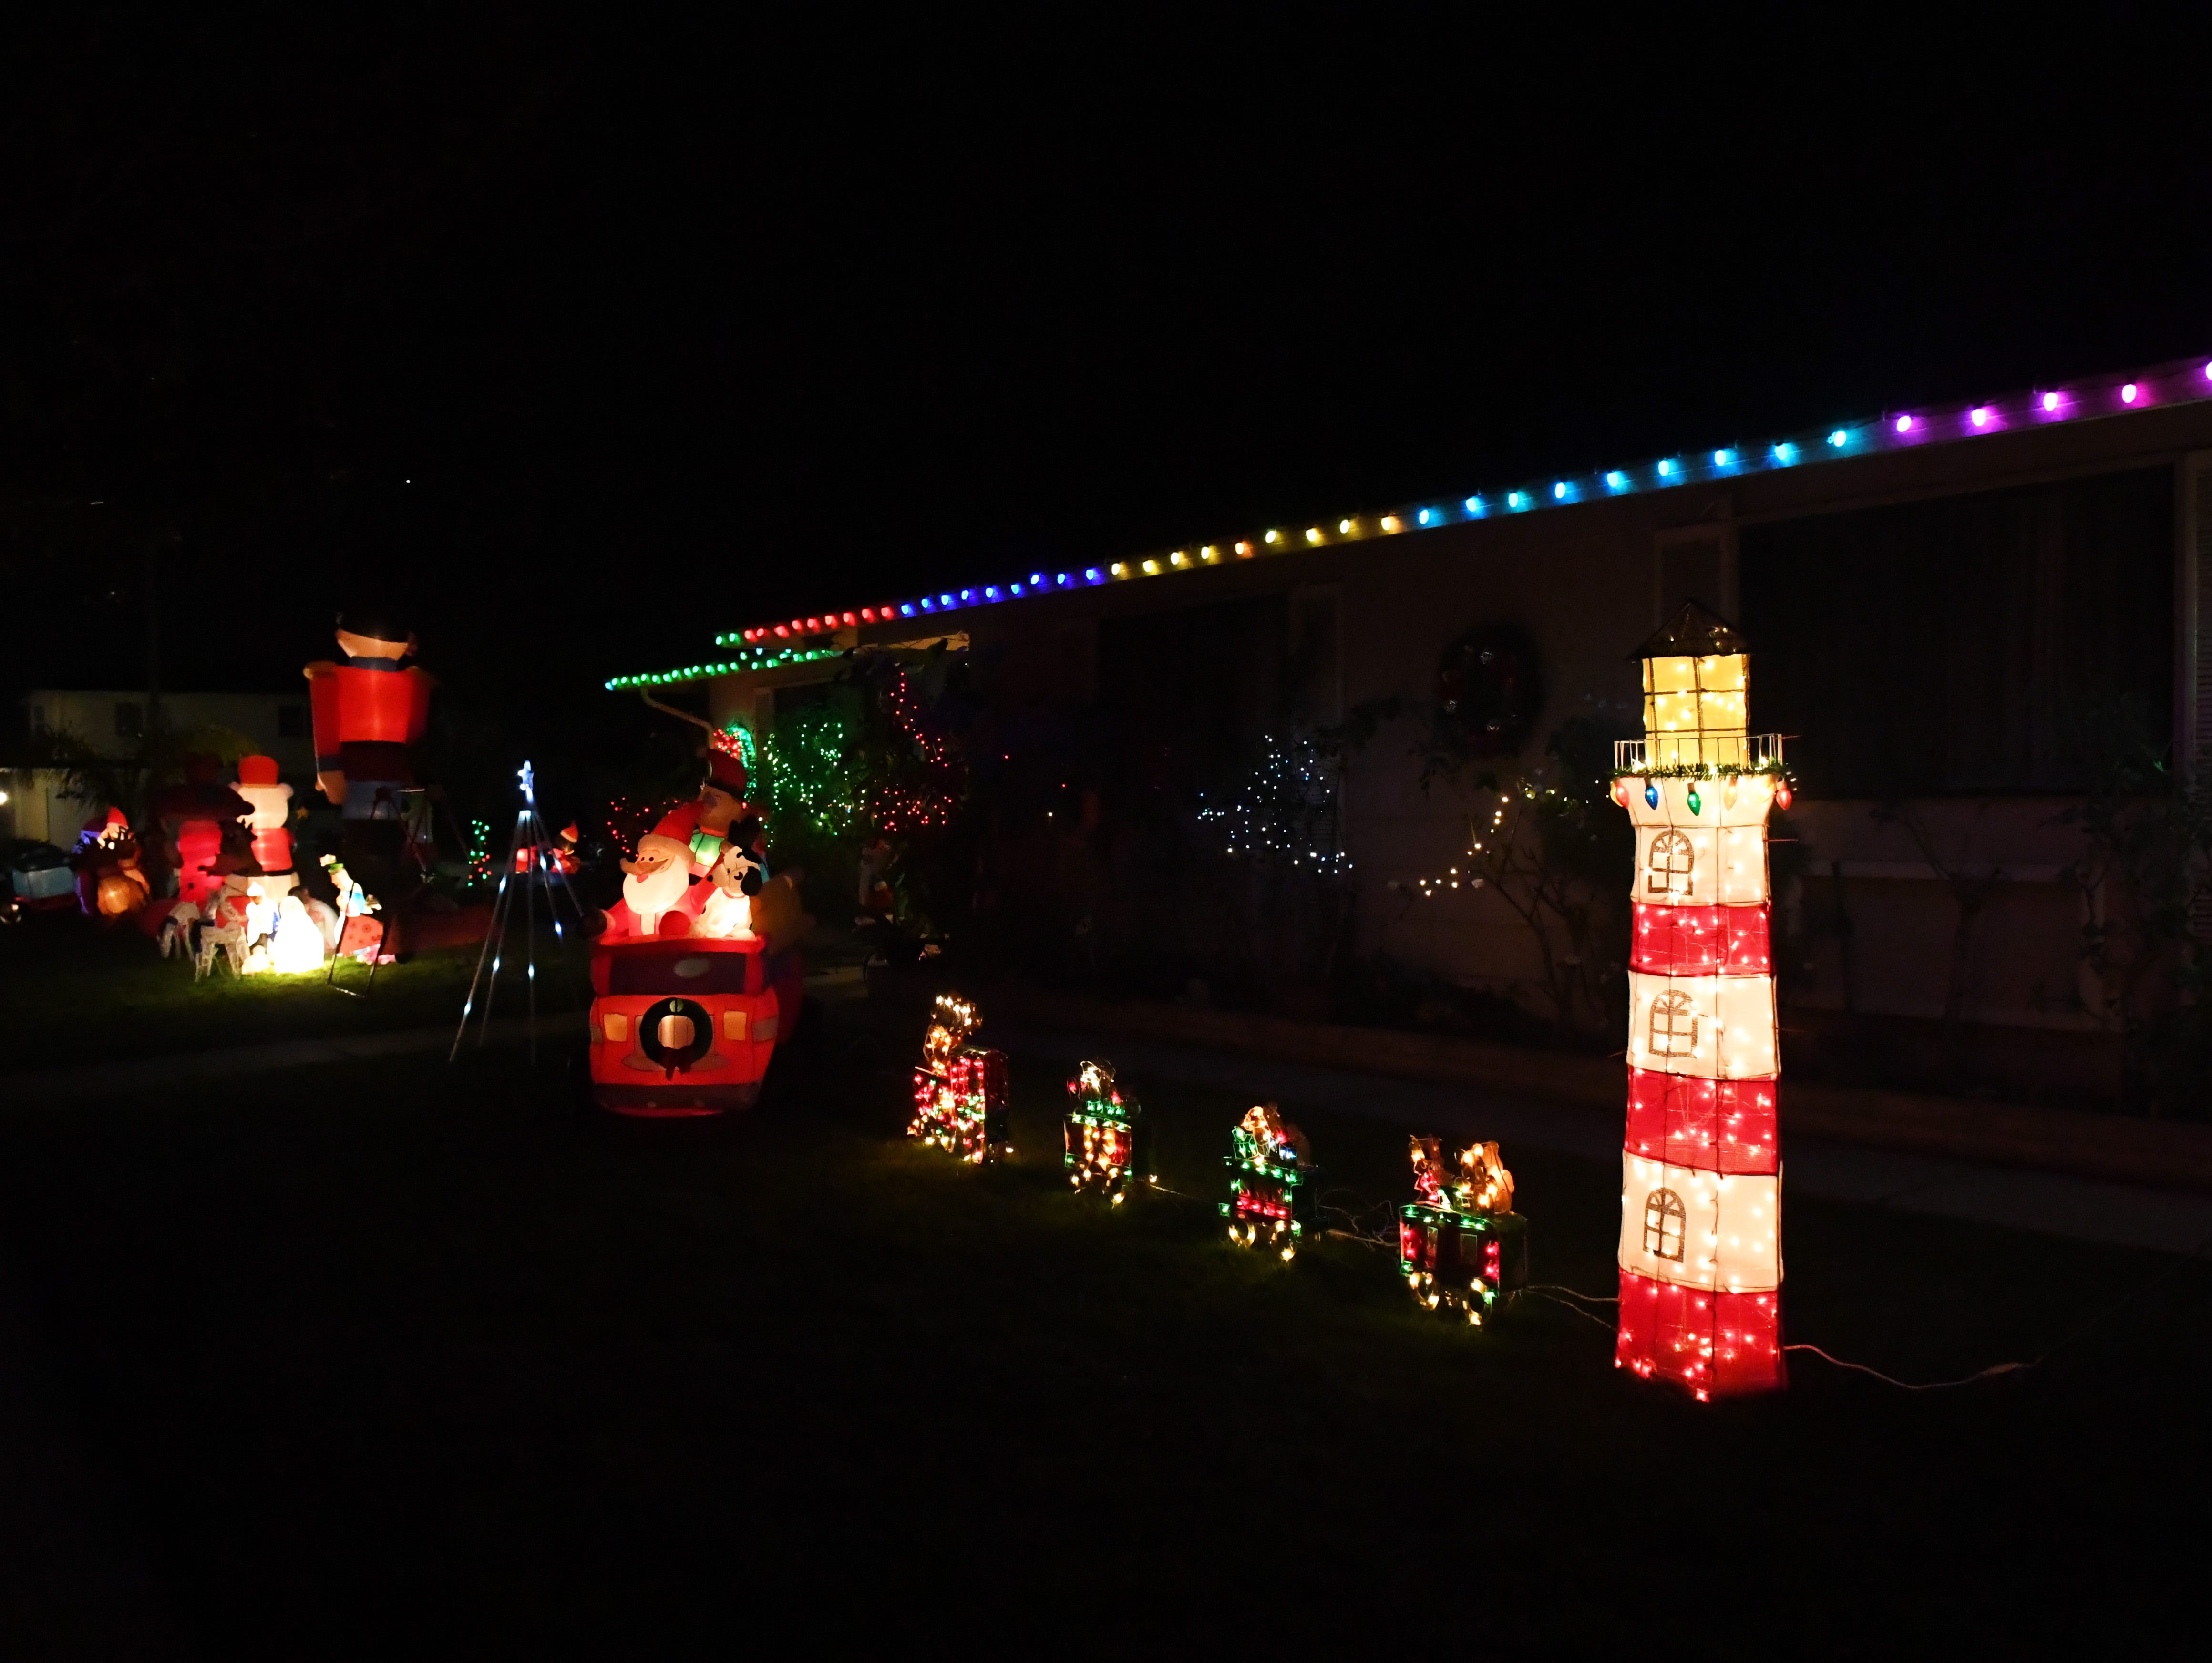 705 Ambrose Drive in Salinas.